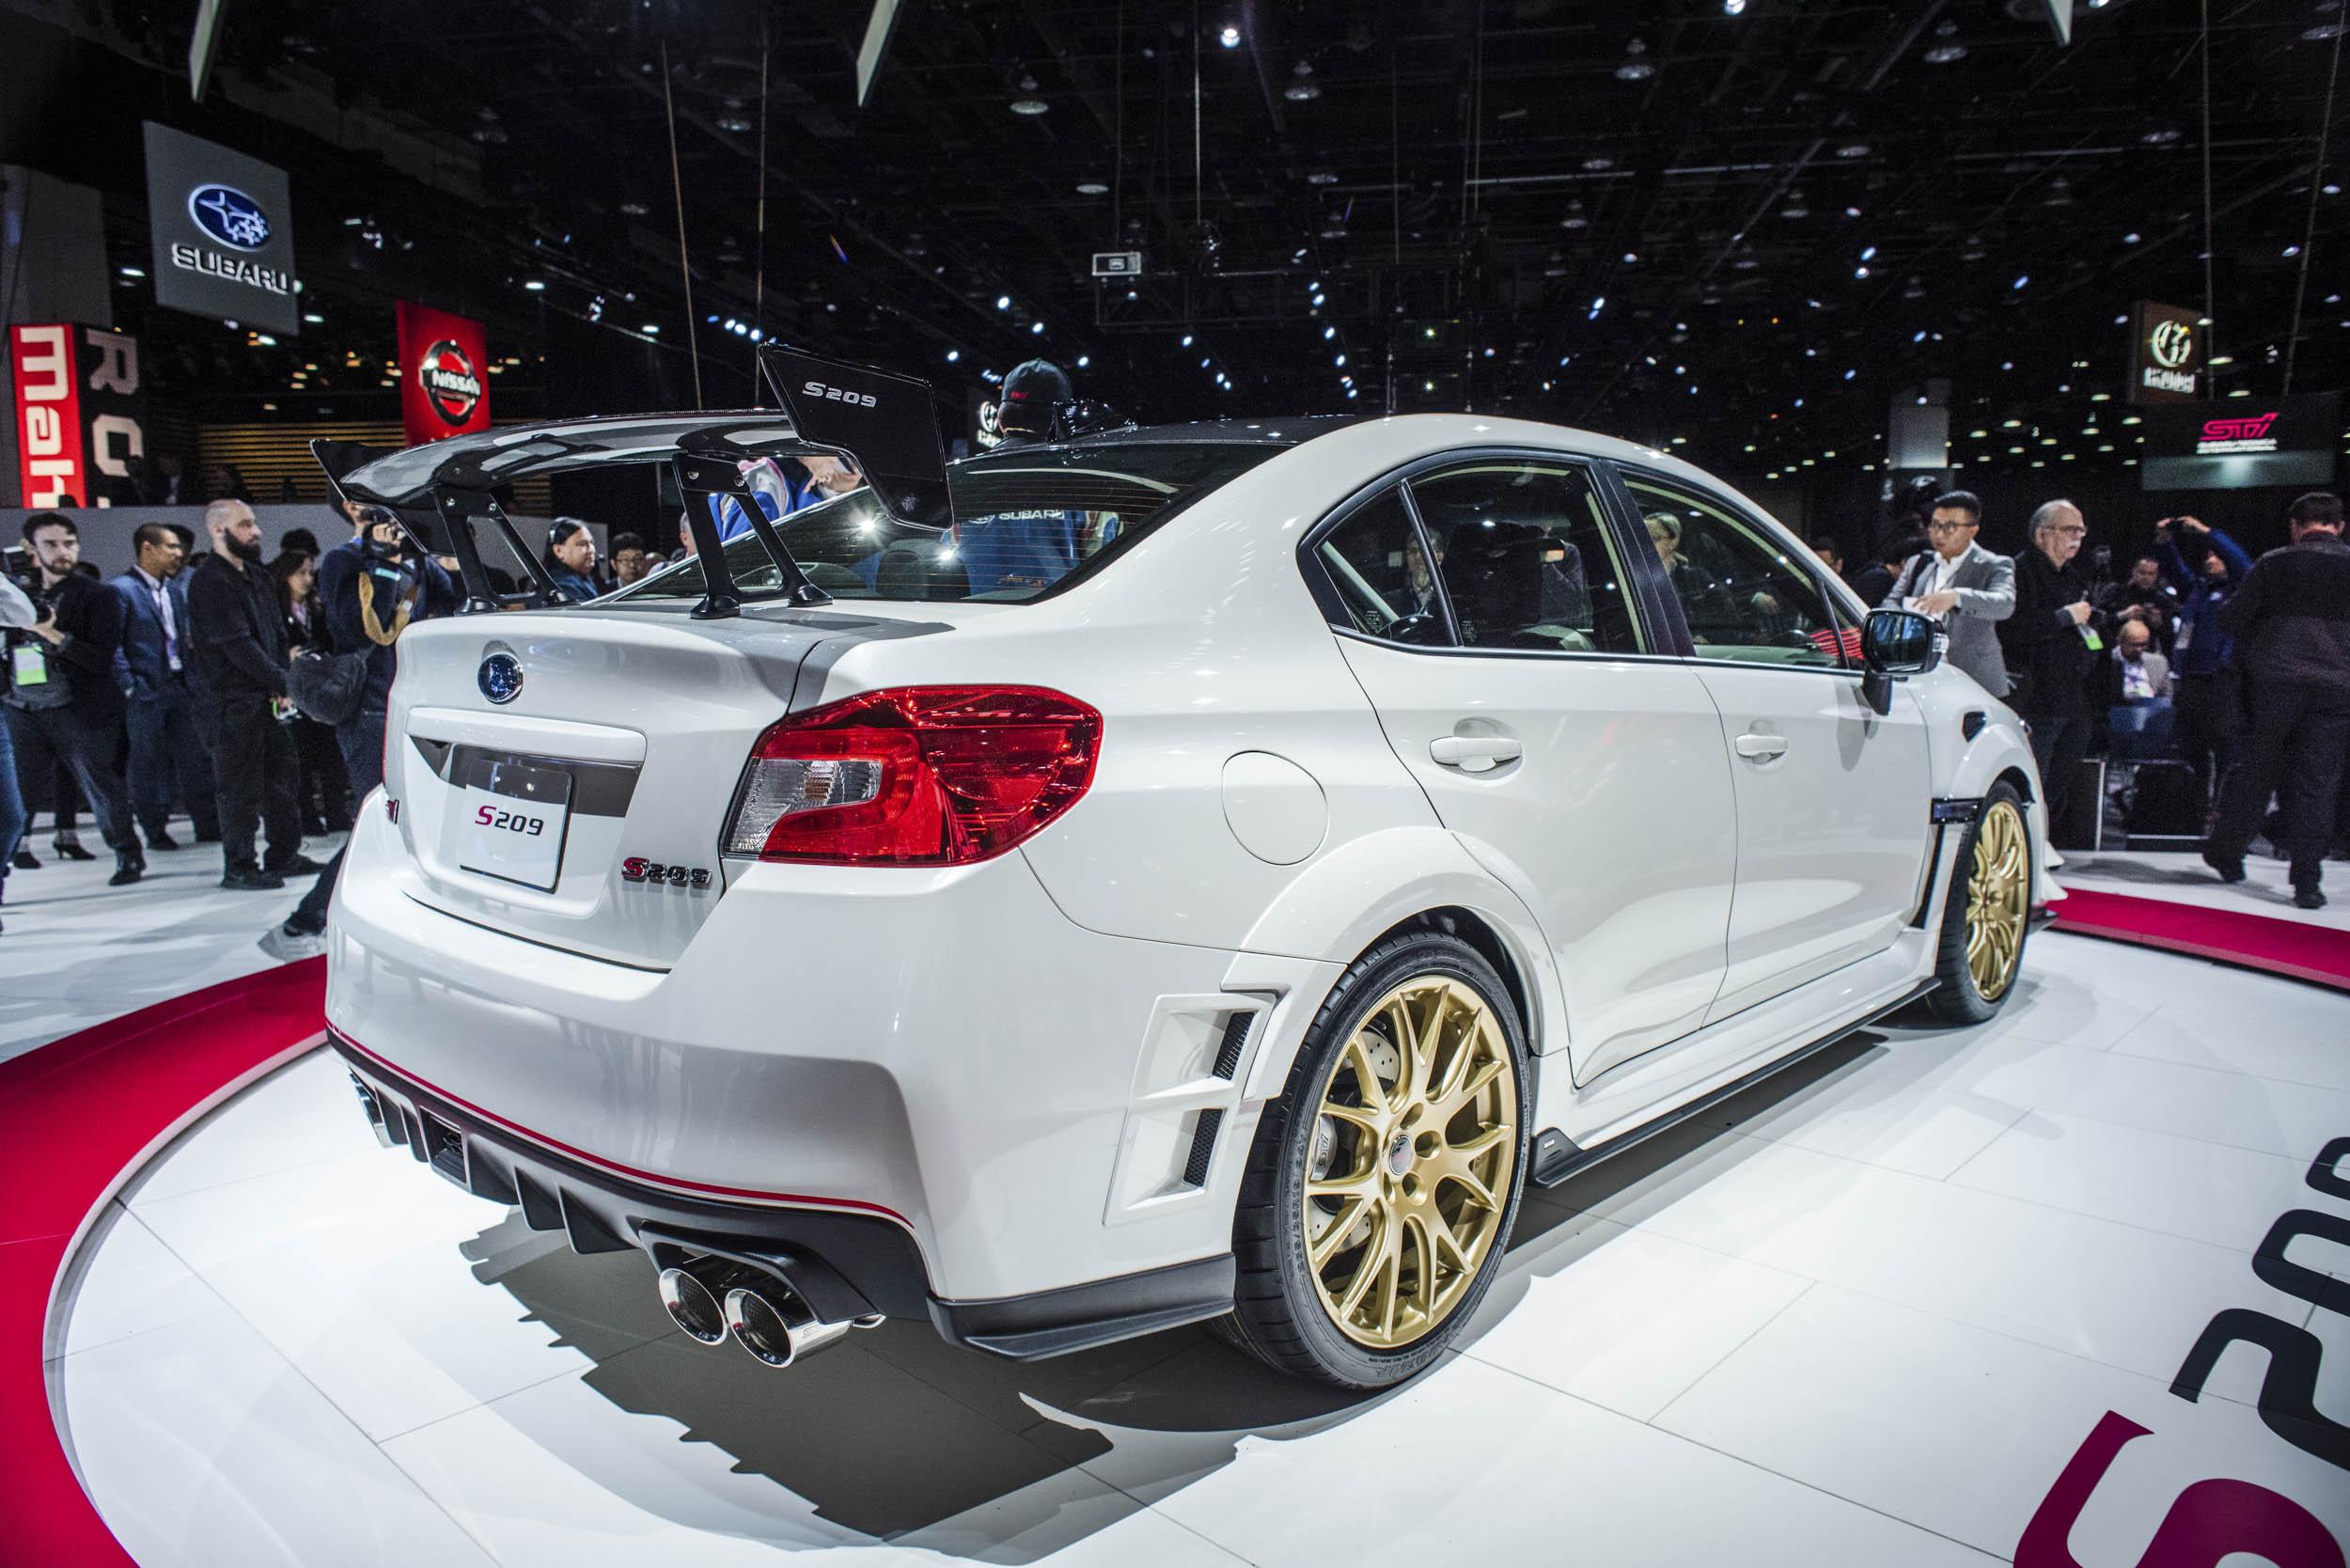 2020 Subaru WRX STI S209 rear 3/4